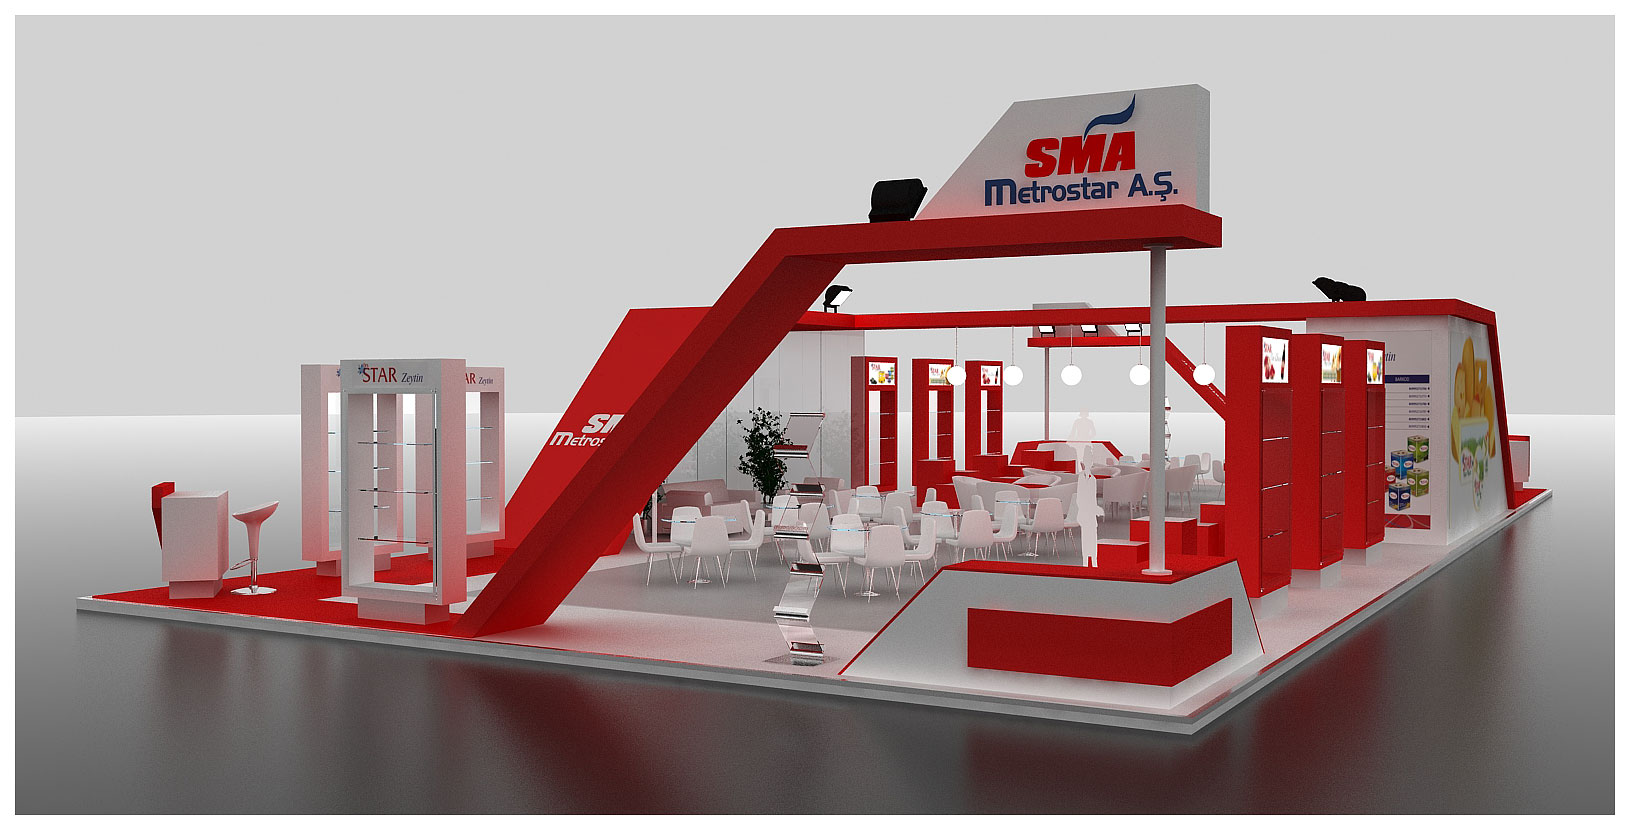 3d Exhibition Design Software : Sma exhibition stand design d by griofismimarlik on